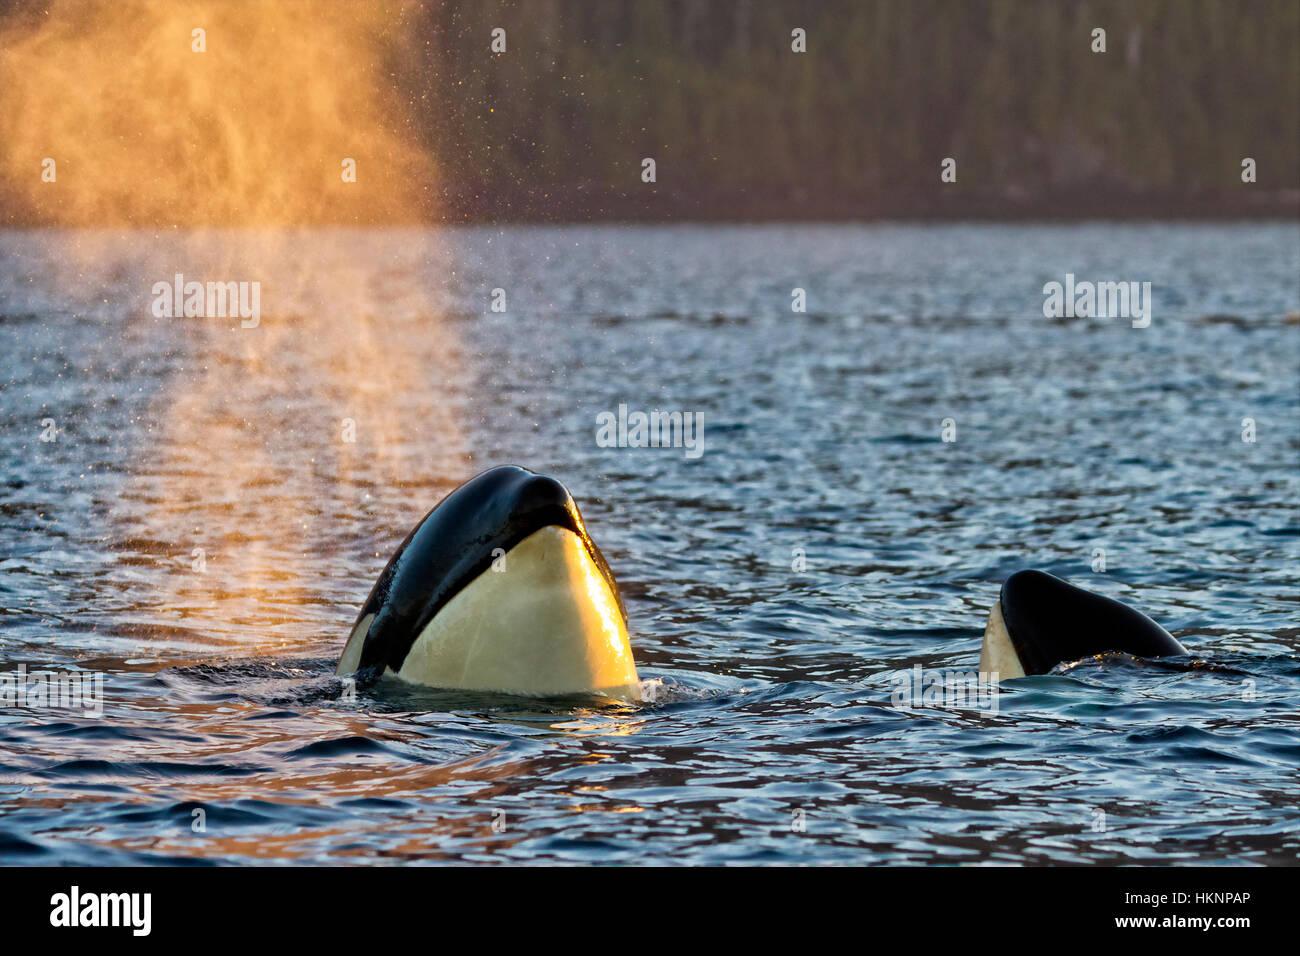 Resident killer whale spy hopping in Johnstone Strait, British Columbia, Canada - Stock Image